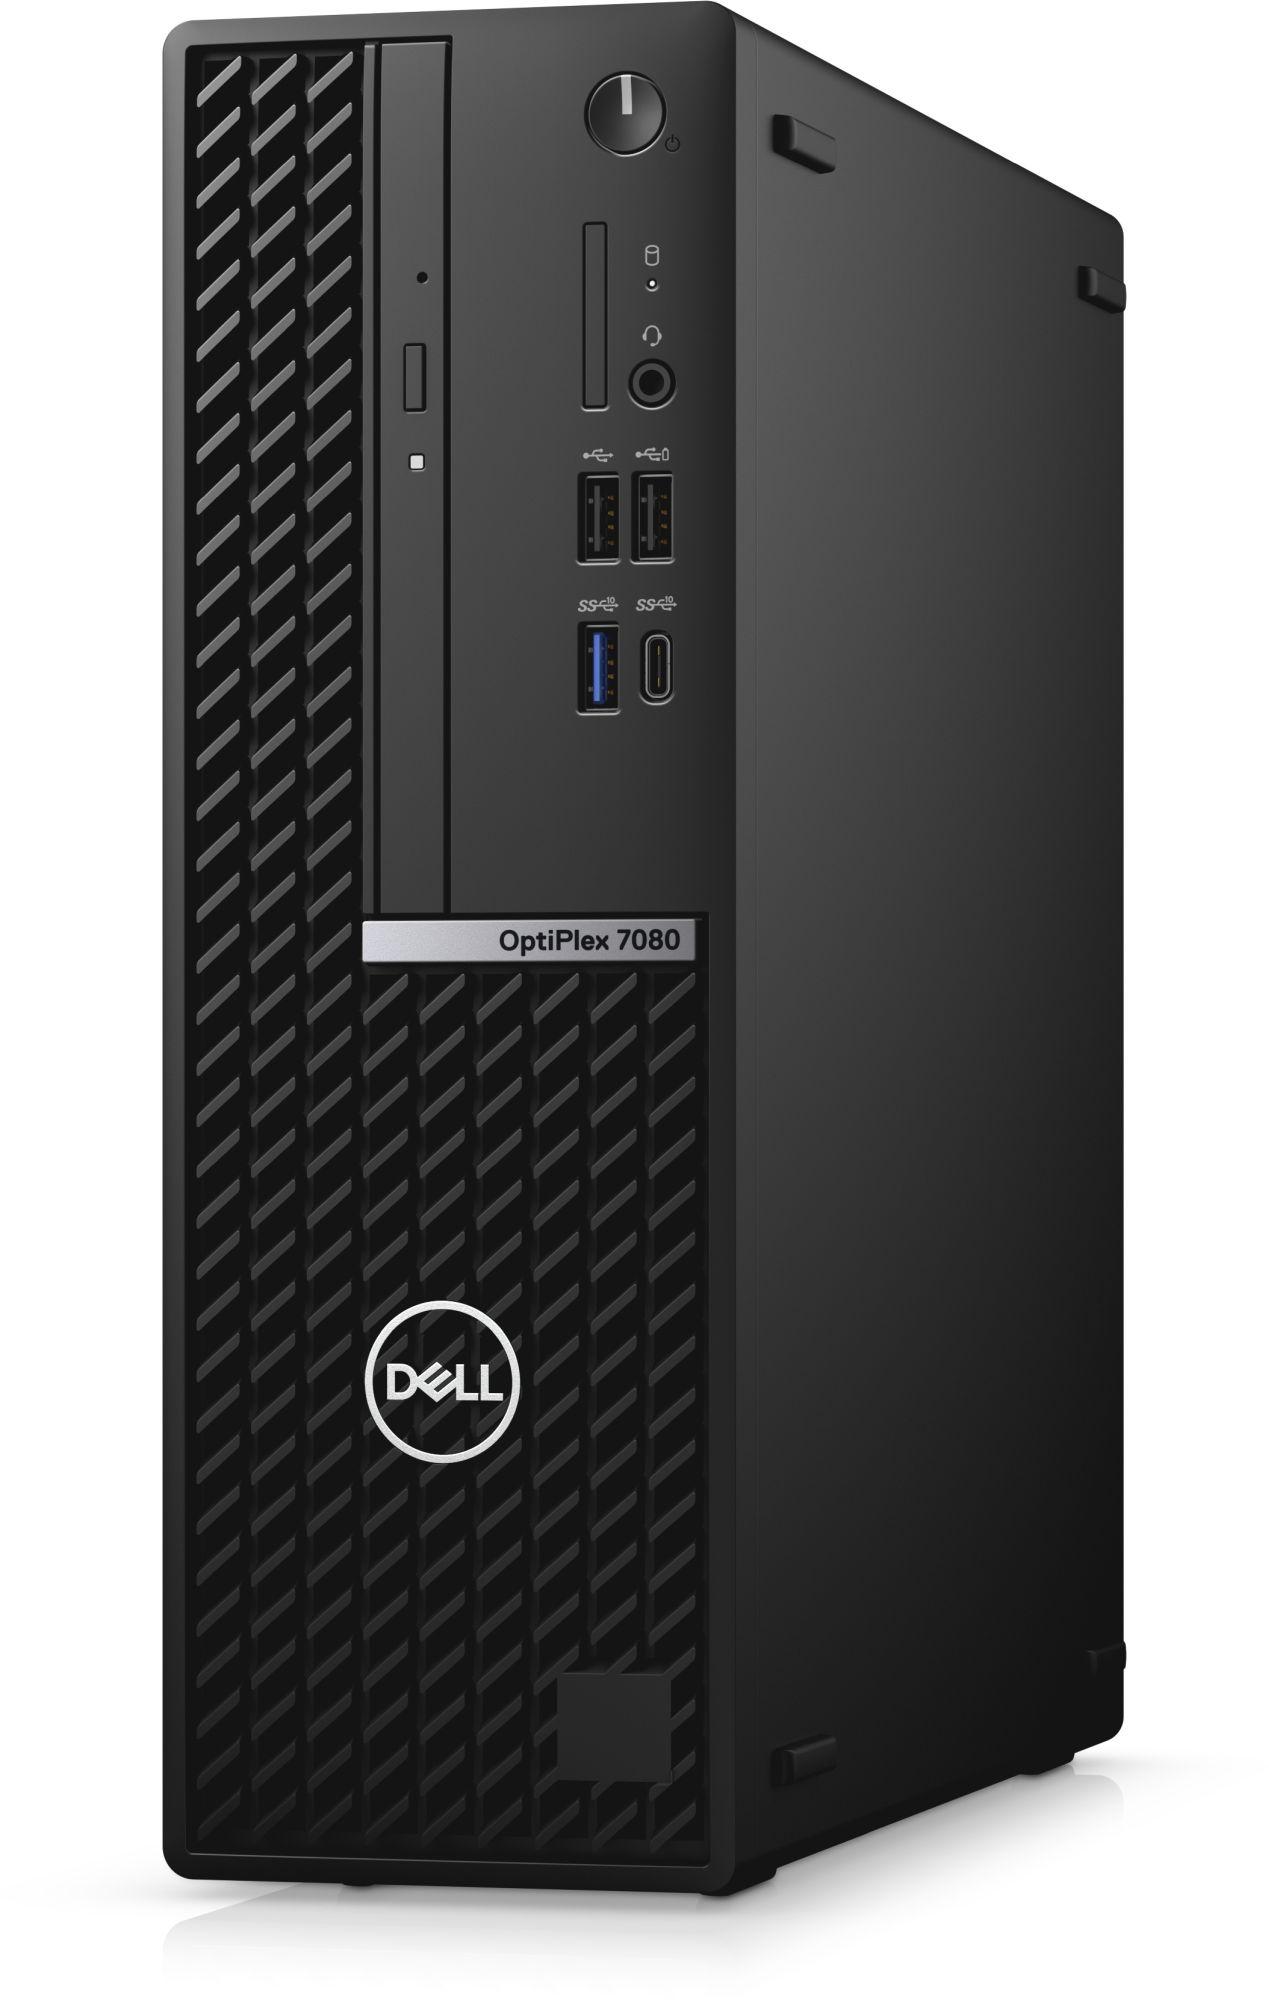 ПК Dell Optiplex 7080 SFF i7 10700 (2.9)/16Gb/SSD512Gb/UHDG 630/DVDRW/CR/Windows 10 Professional/GbitEth/200W/клавиатура/мышь/черный